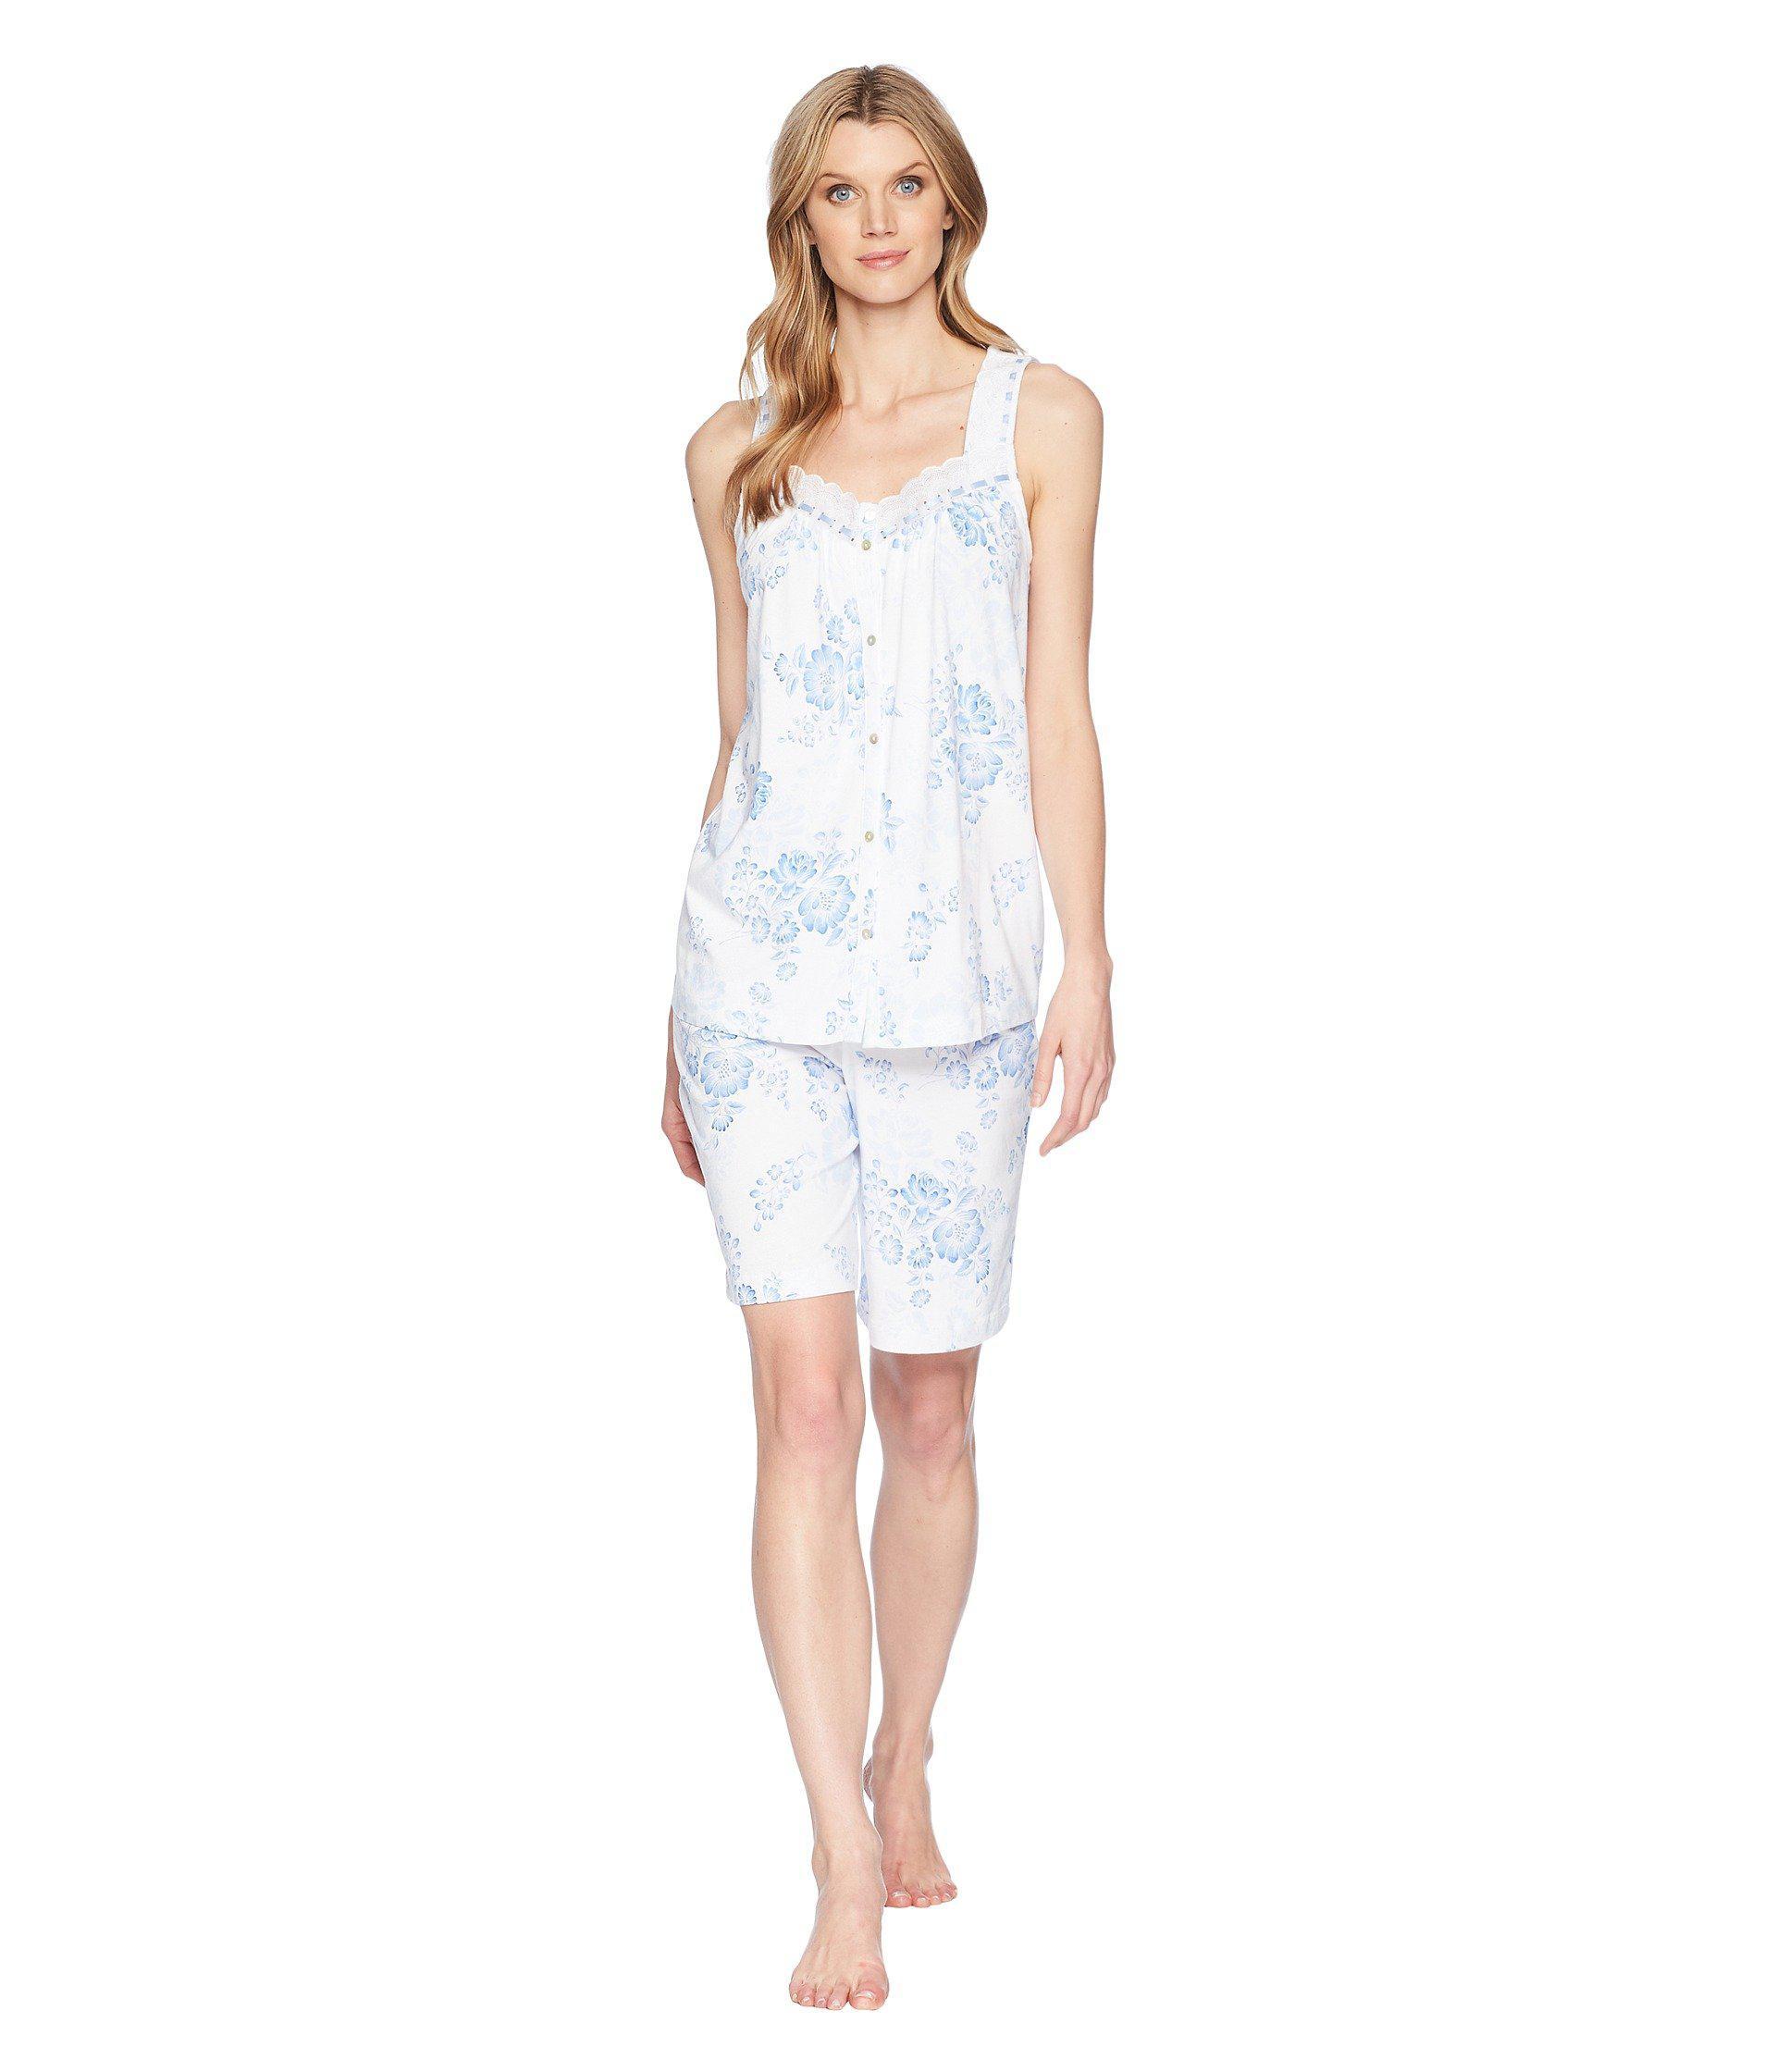 Lyst - Carole Hochman Bermuda Pajama Set in White - Save 29% 3c97e66b8